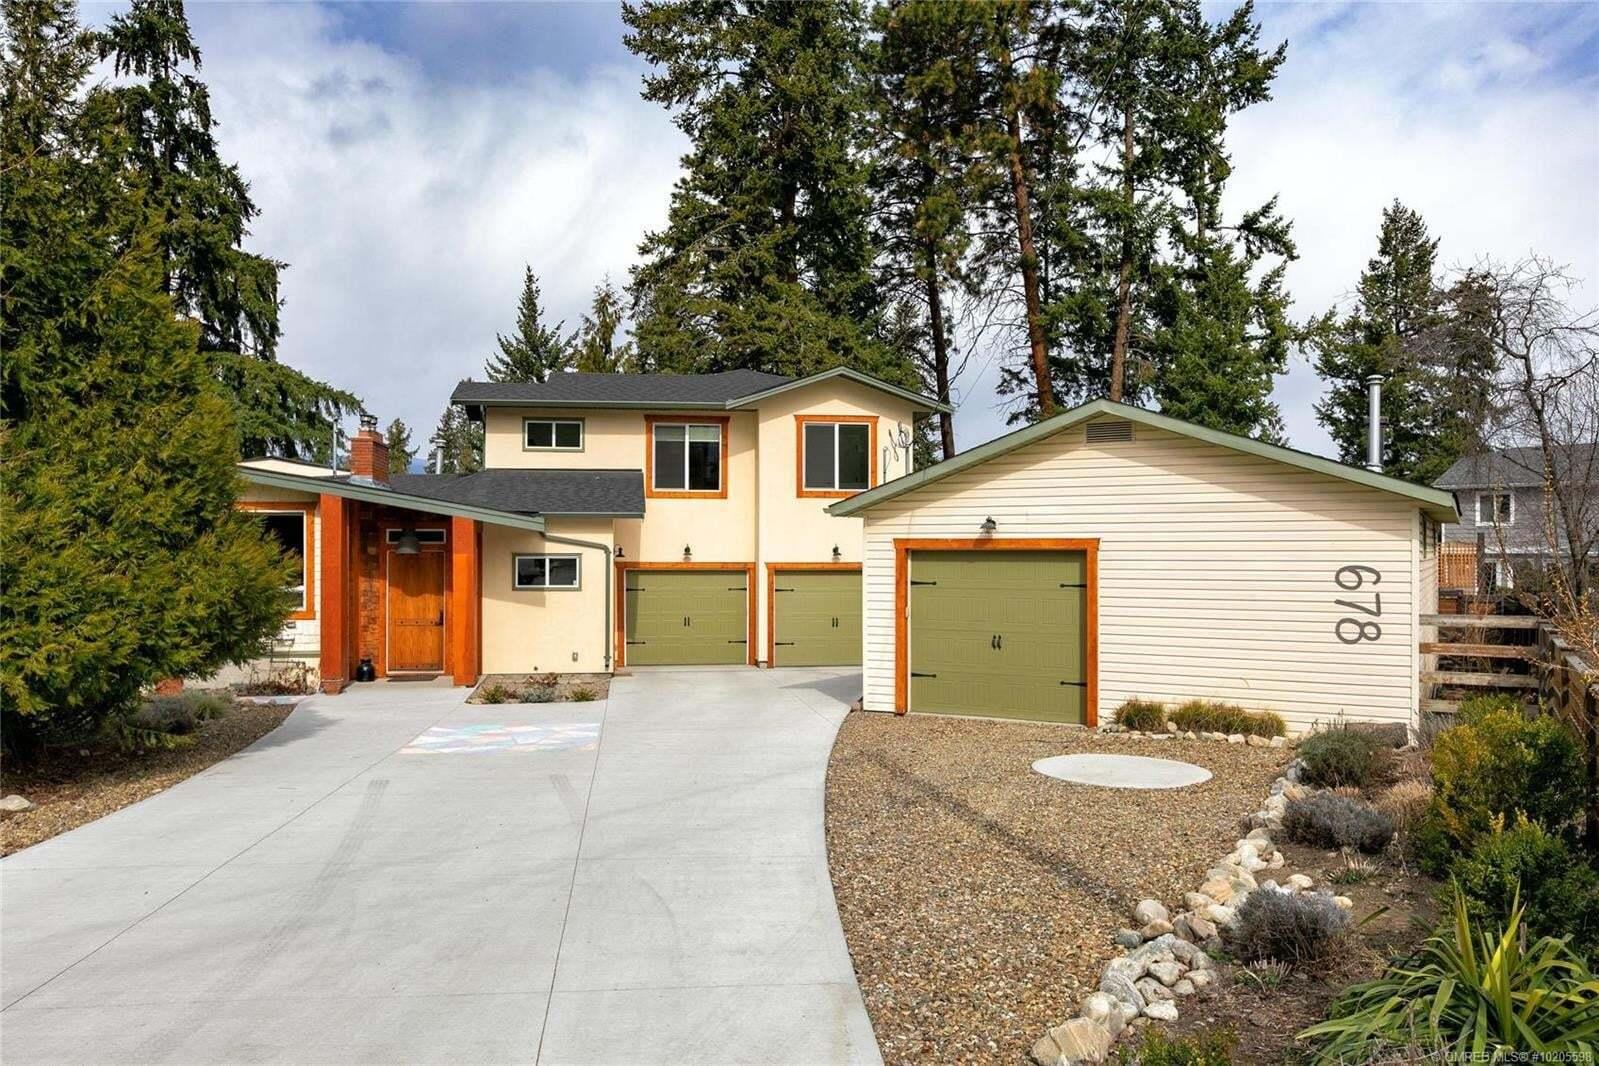 House for sale at 678 Elm Rd Kelowna British Columbia - MLS: 10205598